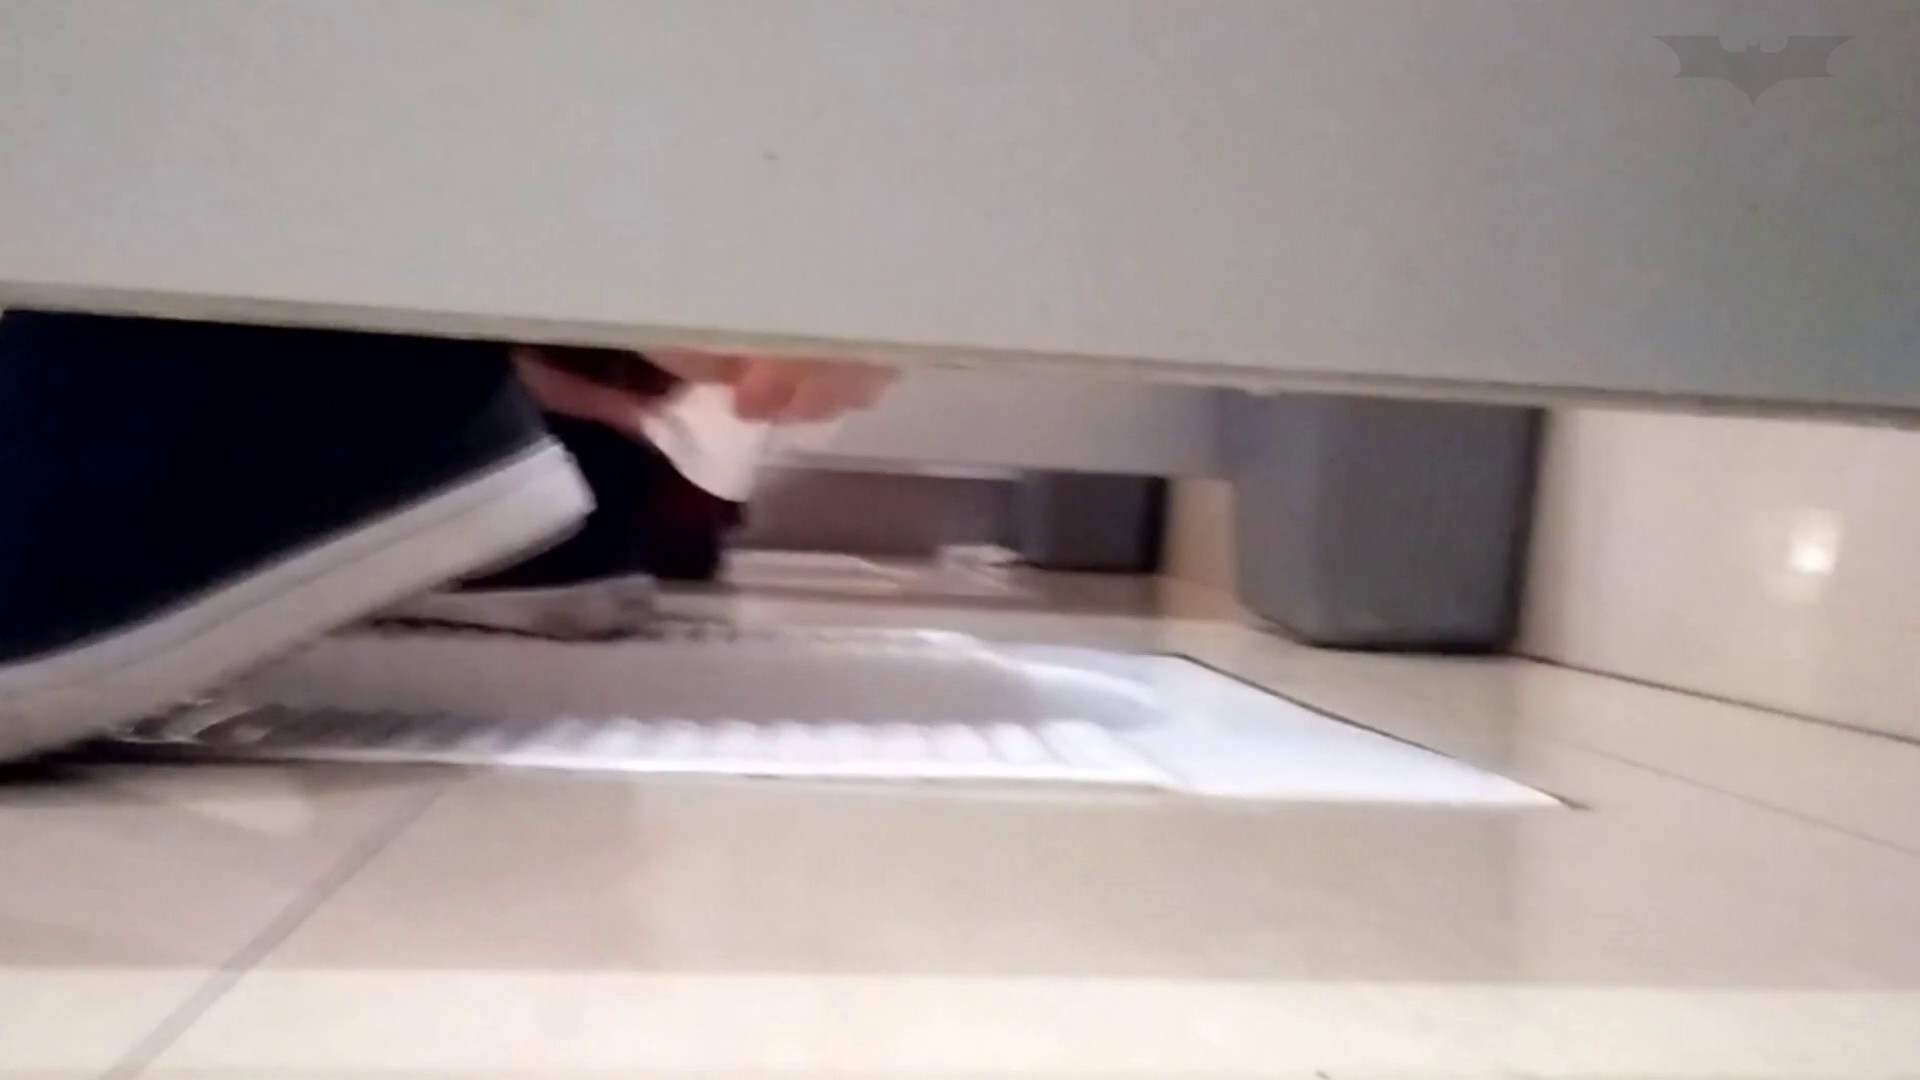 芸術大学ガチ潜入盗撮 JD盗撮 美女の洗面所の秘密 Vol.97 潜入 セックス無修正動画無料 109枚 106